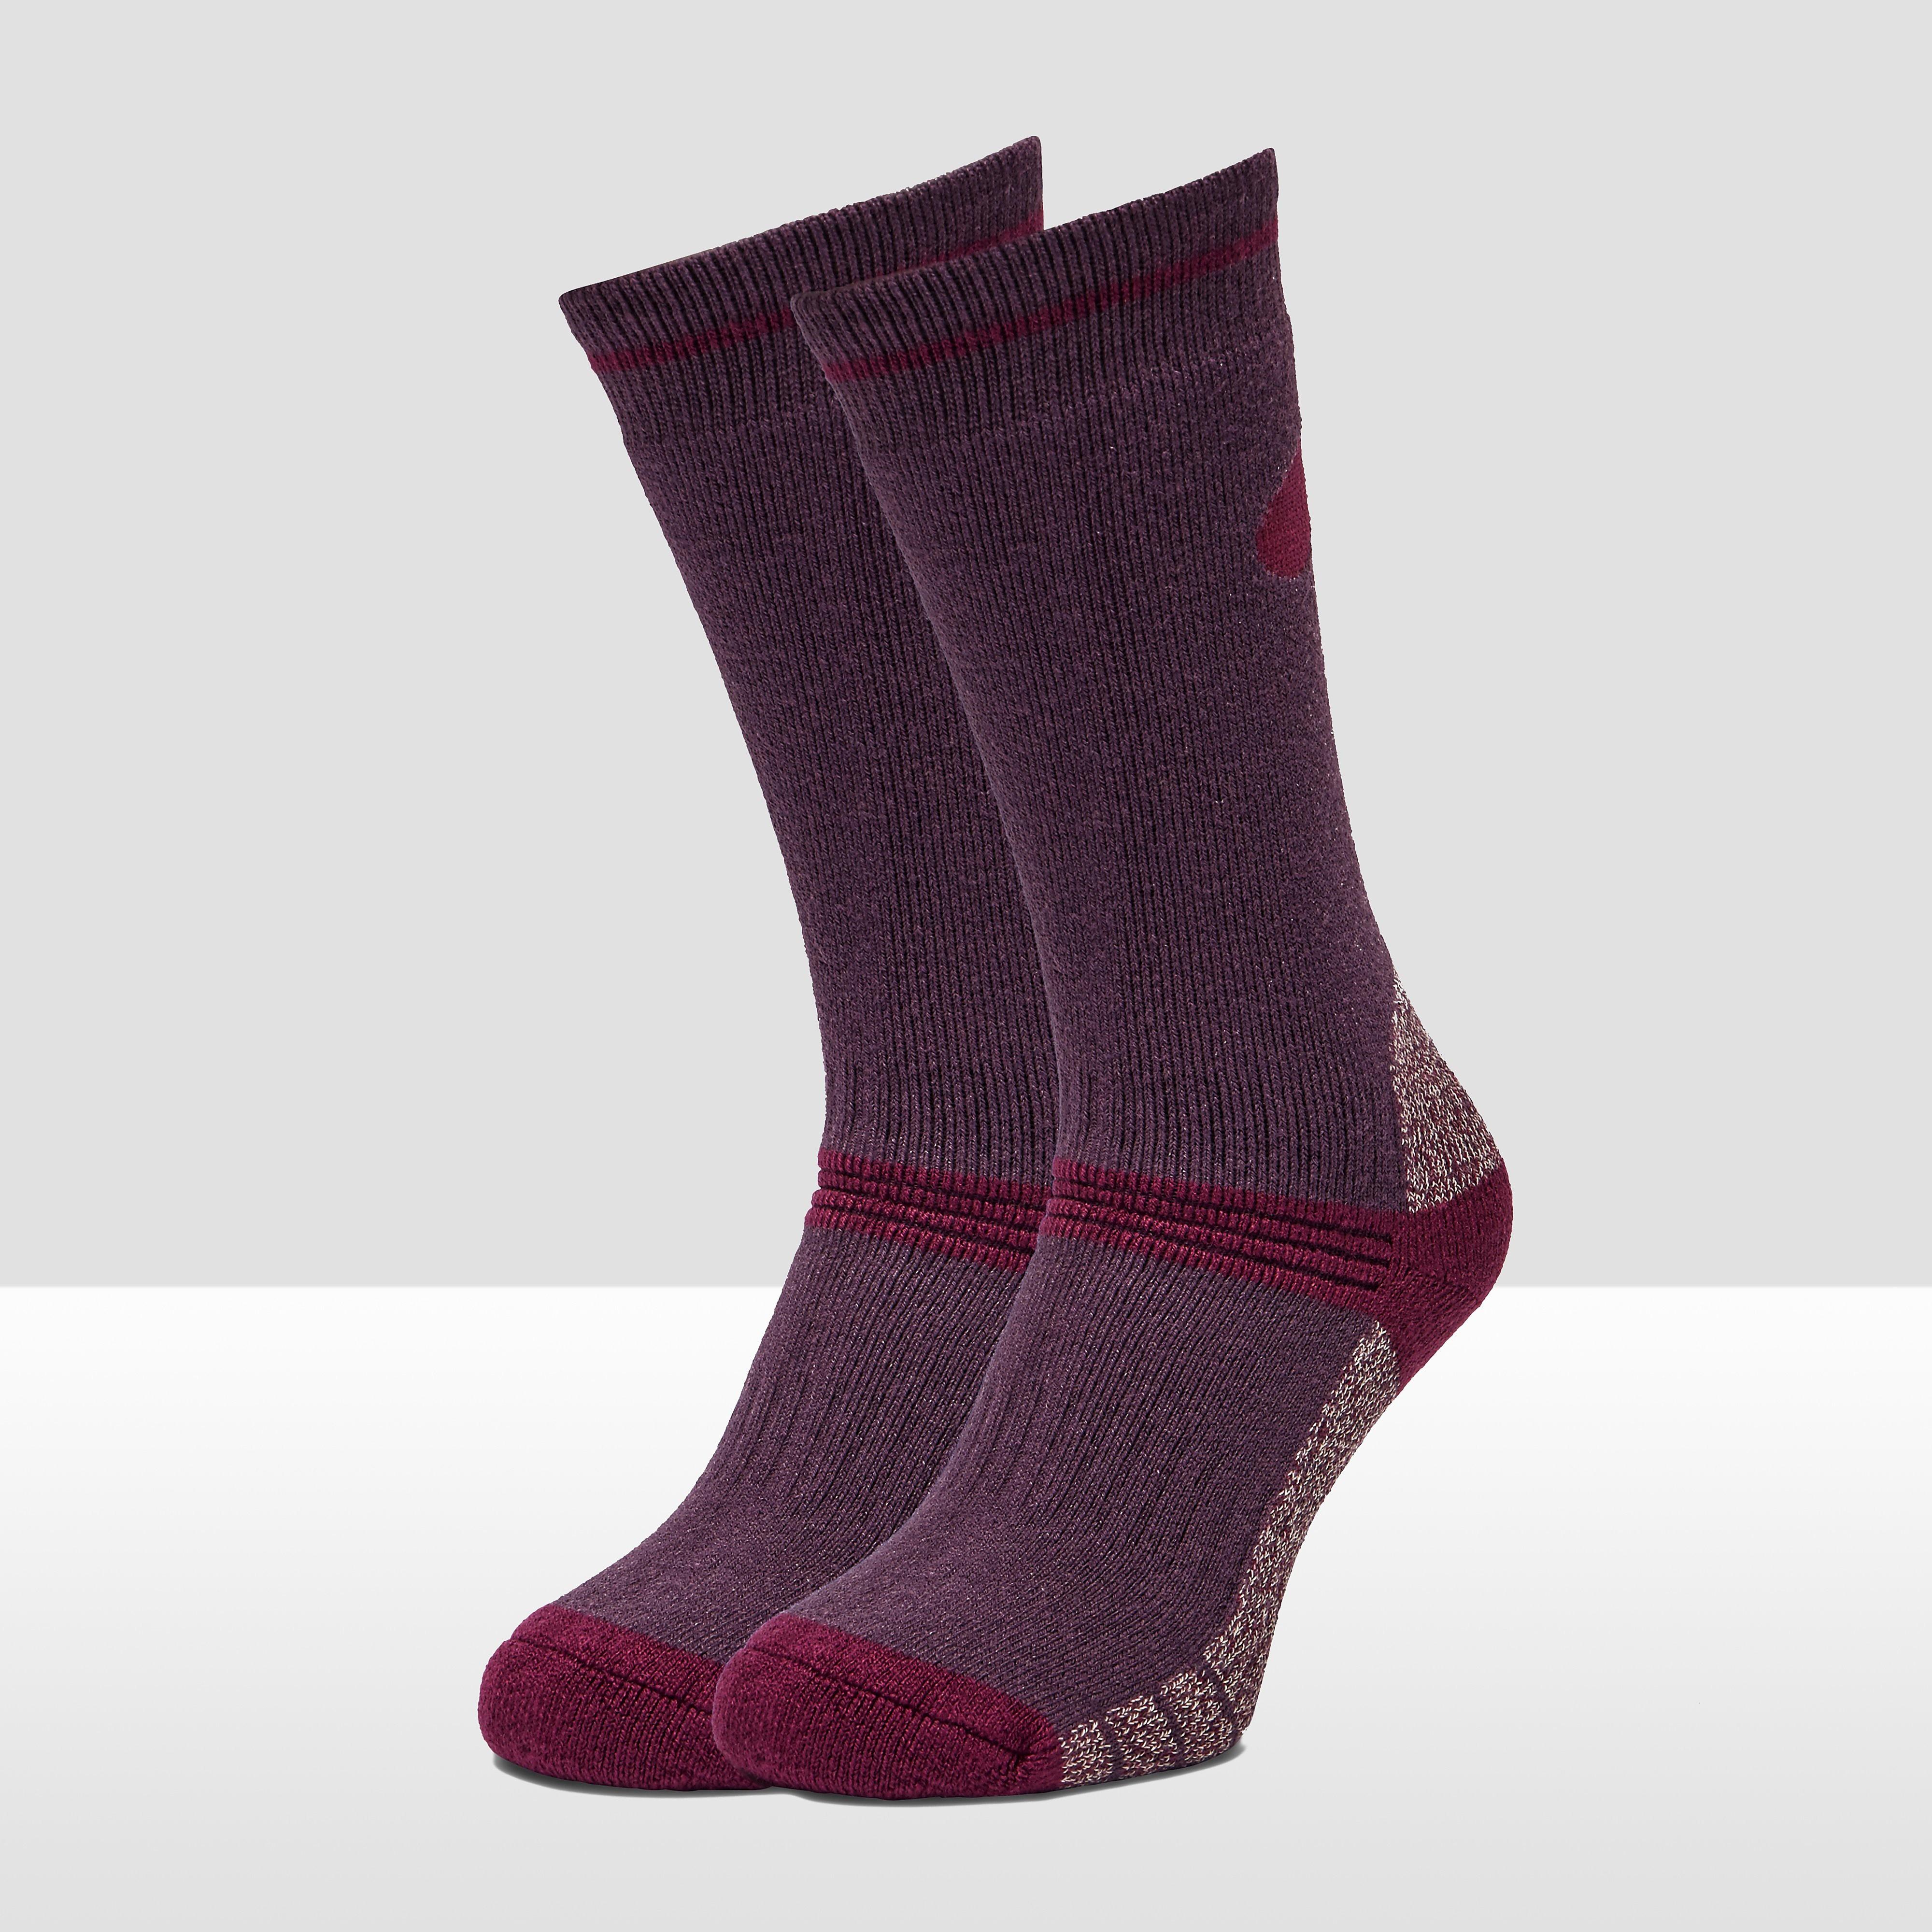 Peter Storm Women's Heavyweight Outdoor Socks